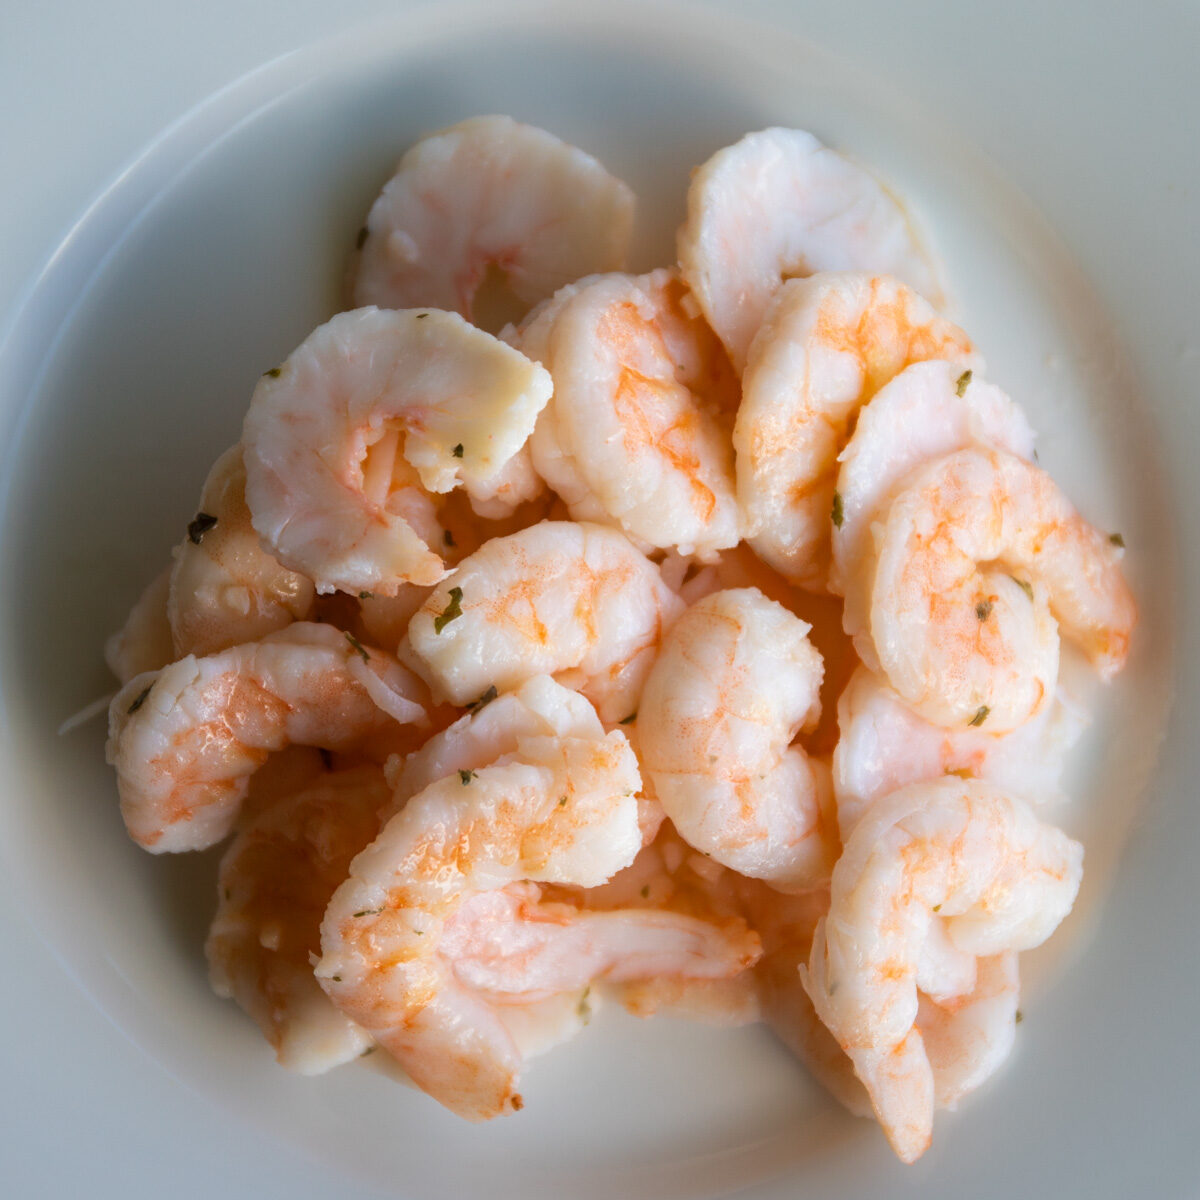 Marinated shrimp make salad rolls quick and easy